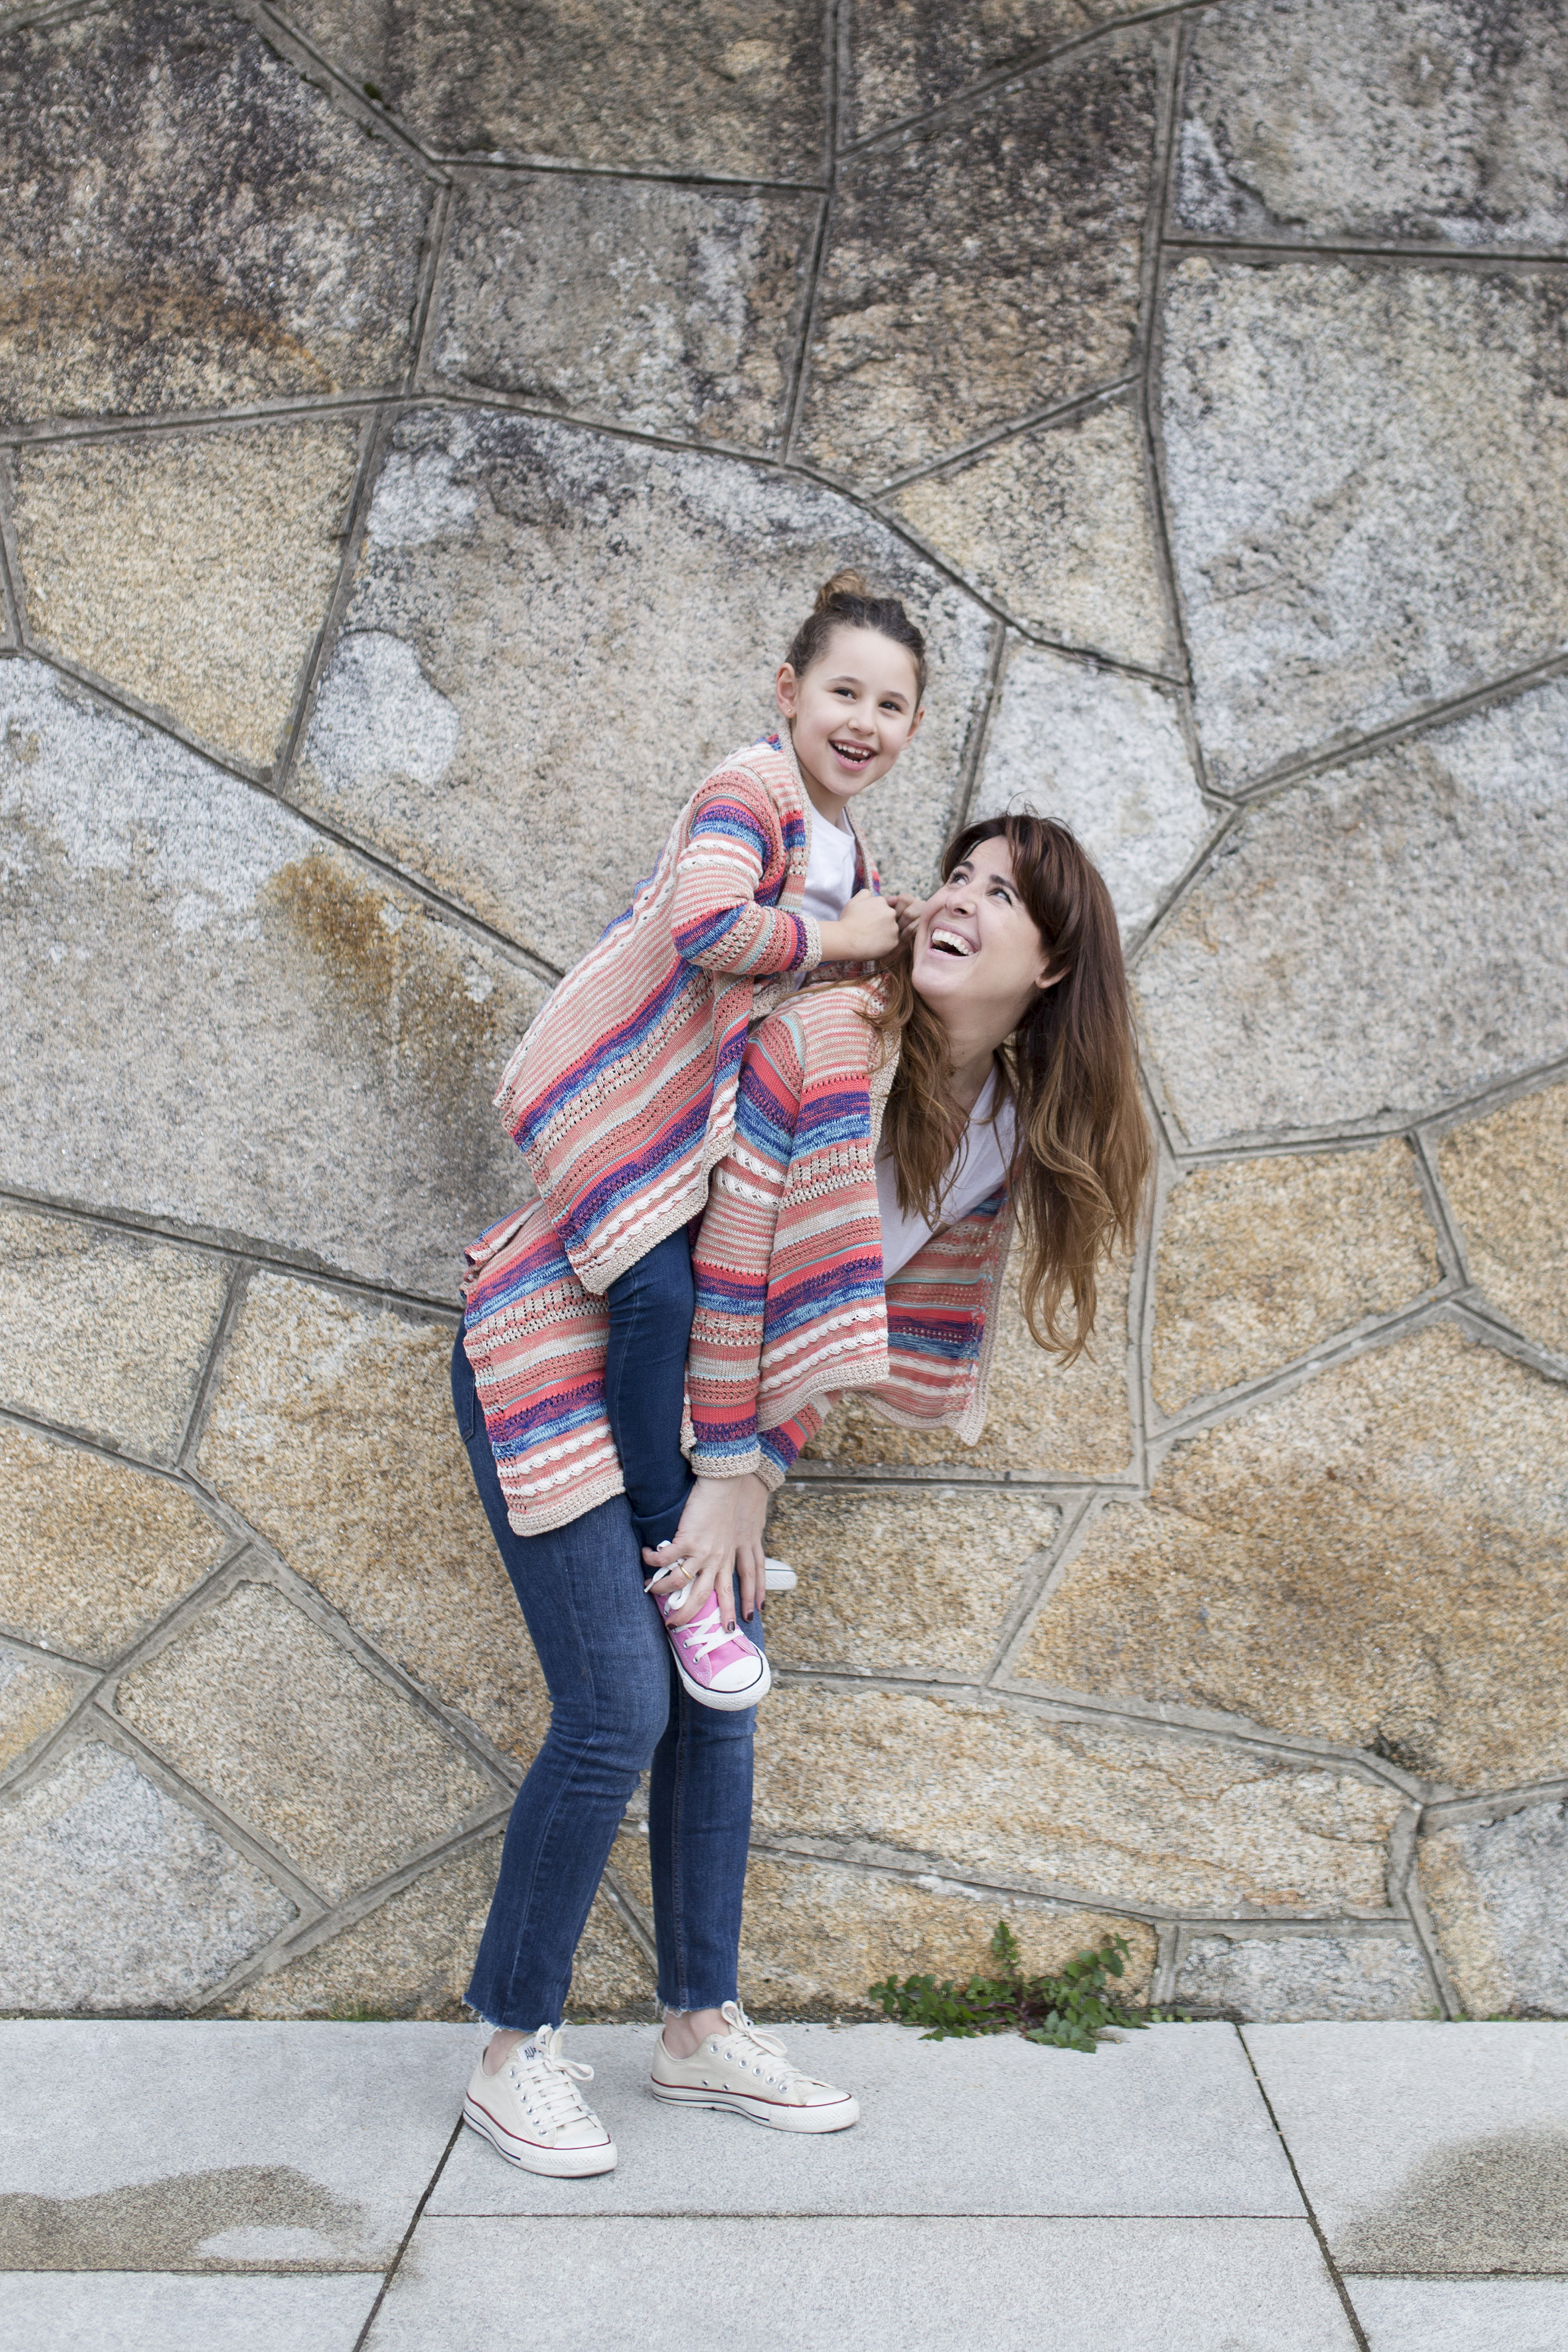 madre e hija-zara kids-Viajar en familia-descalzaporelparque-coruña-lifestyle- kids- converse-daughter